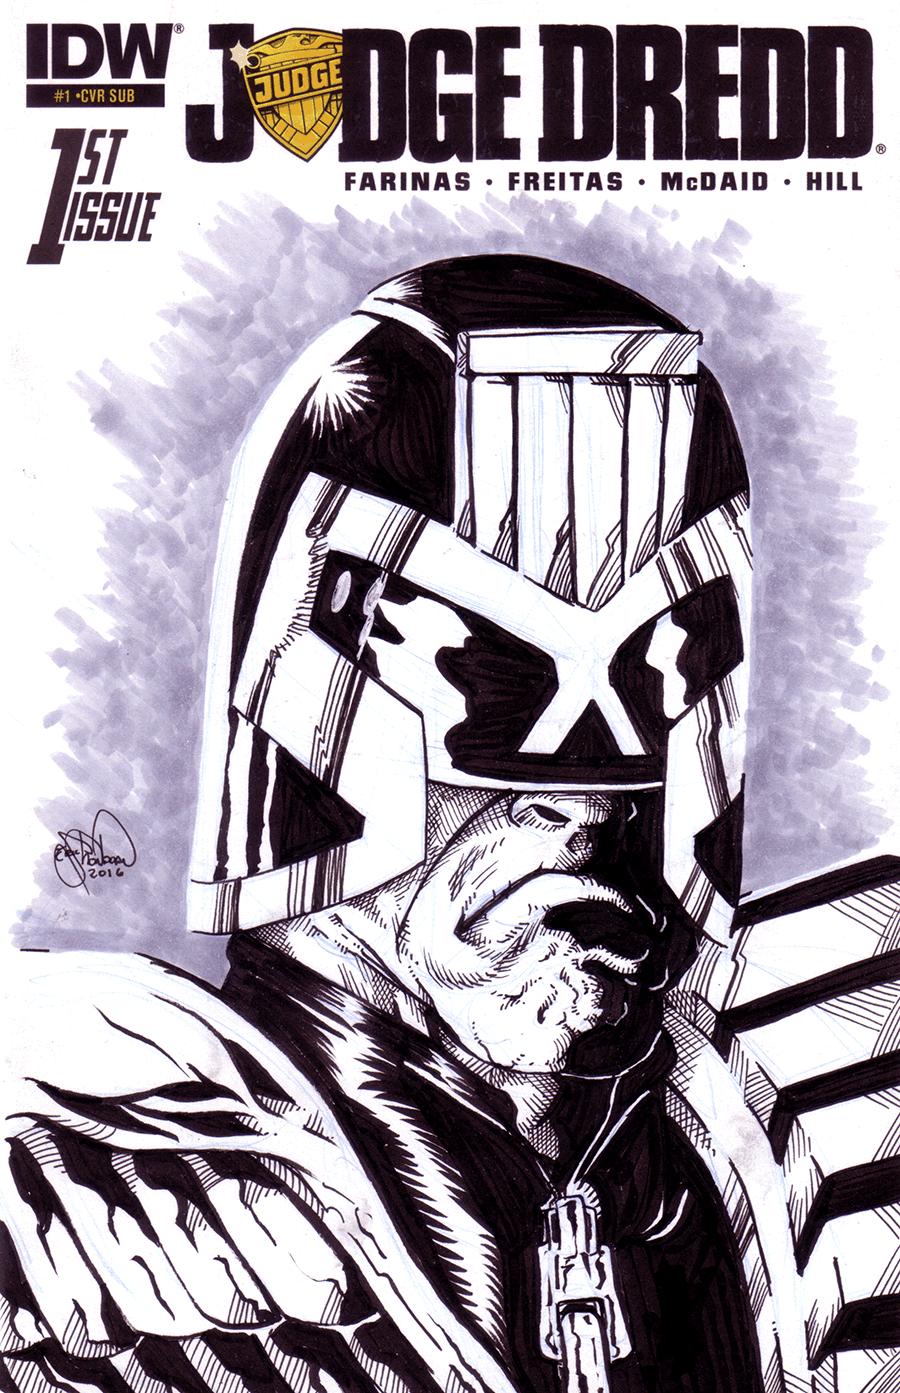 497. Judge Dredd